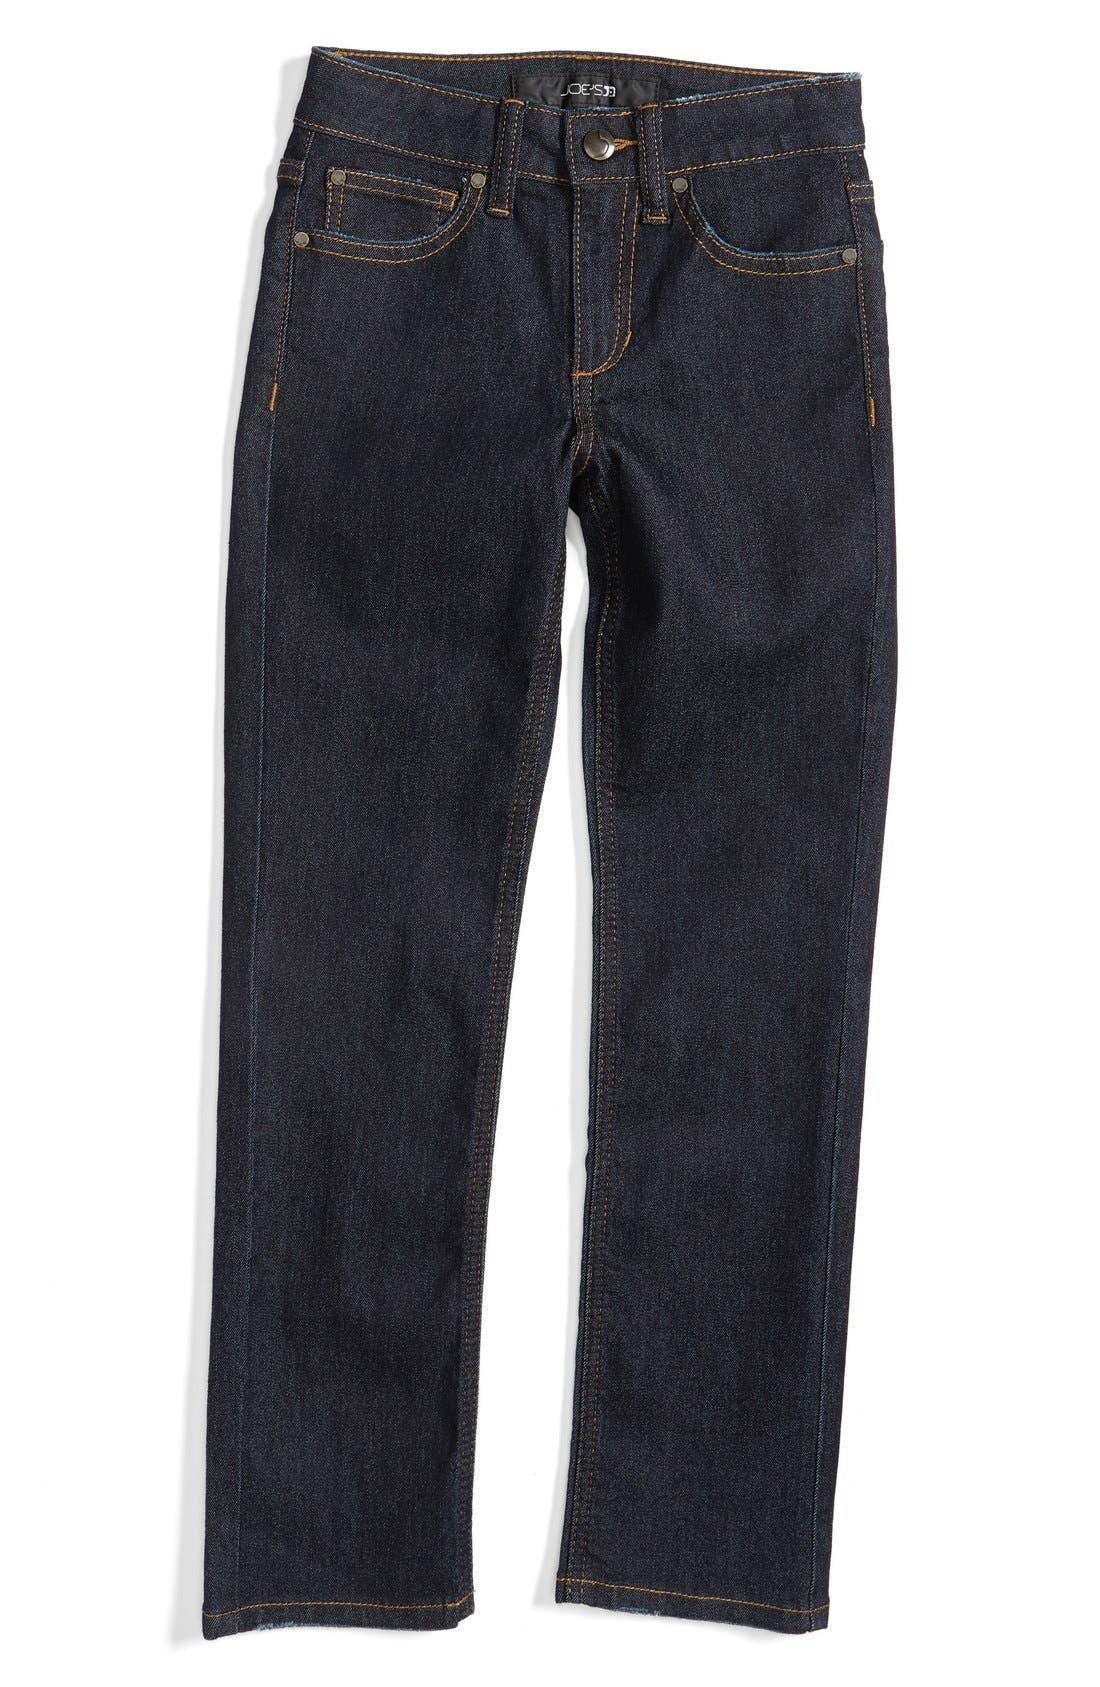 Brixton Straight Leg Jeans,                         Main,                         color,